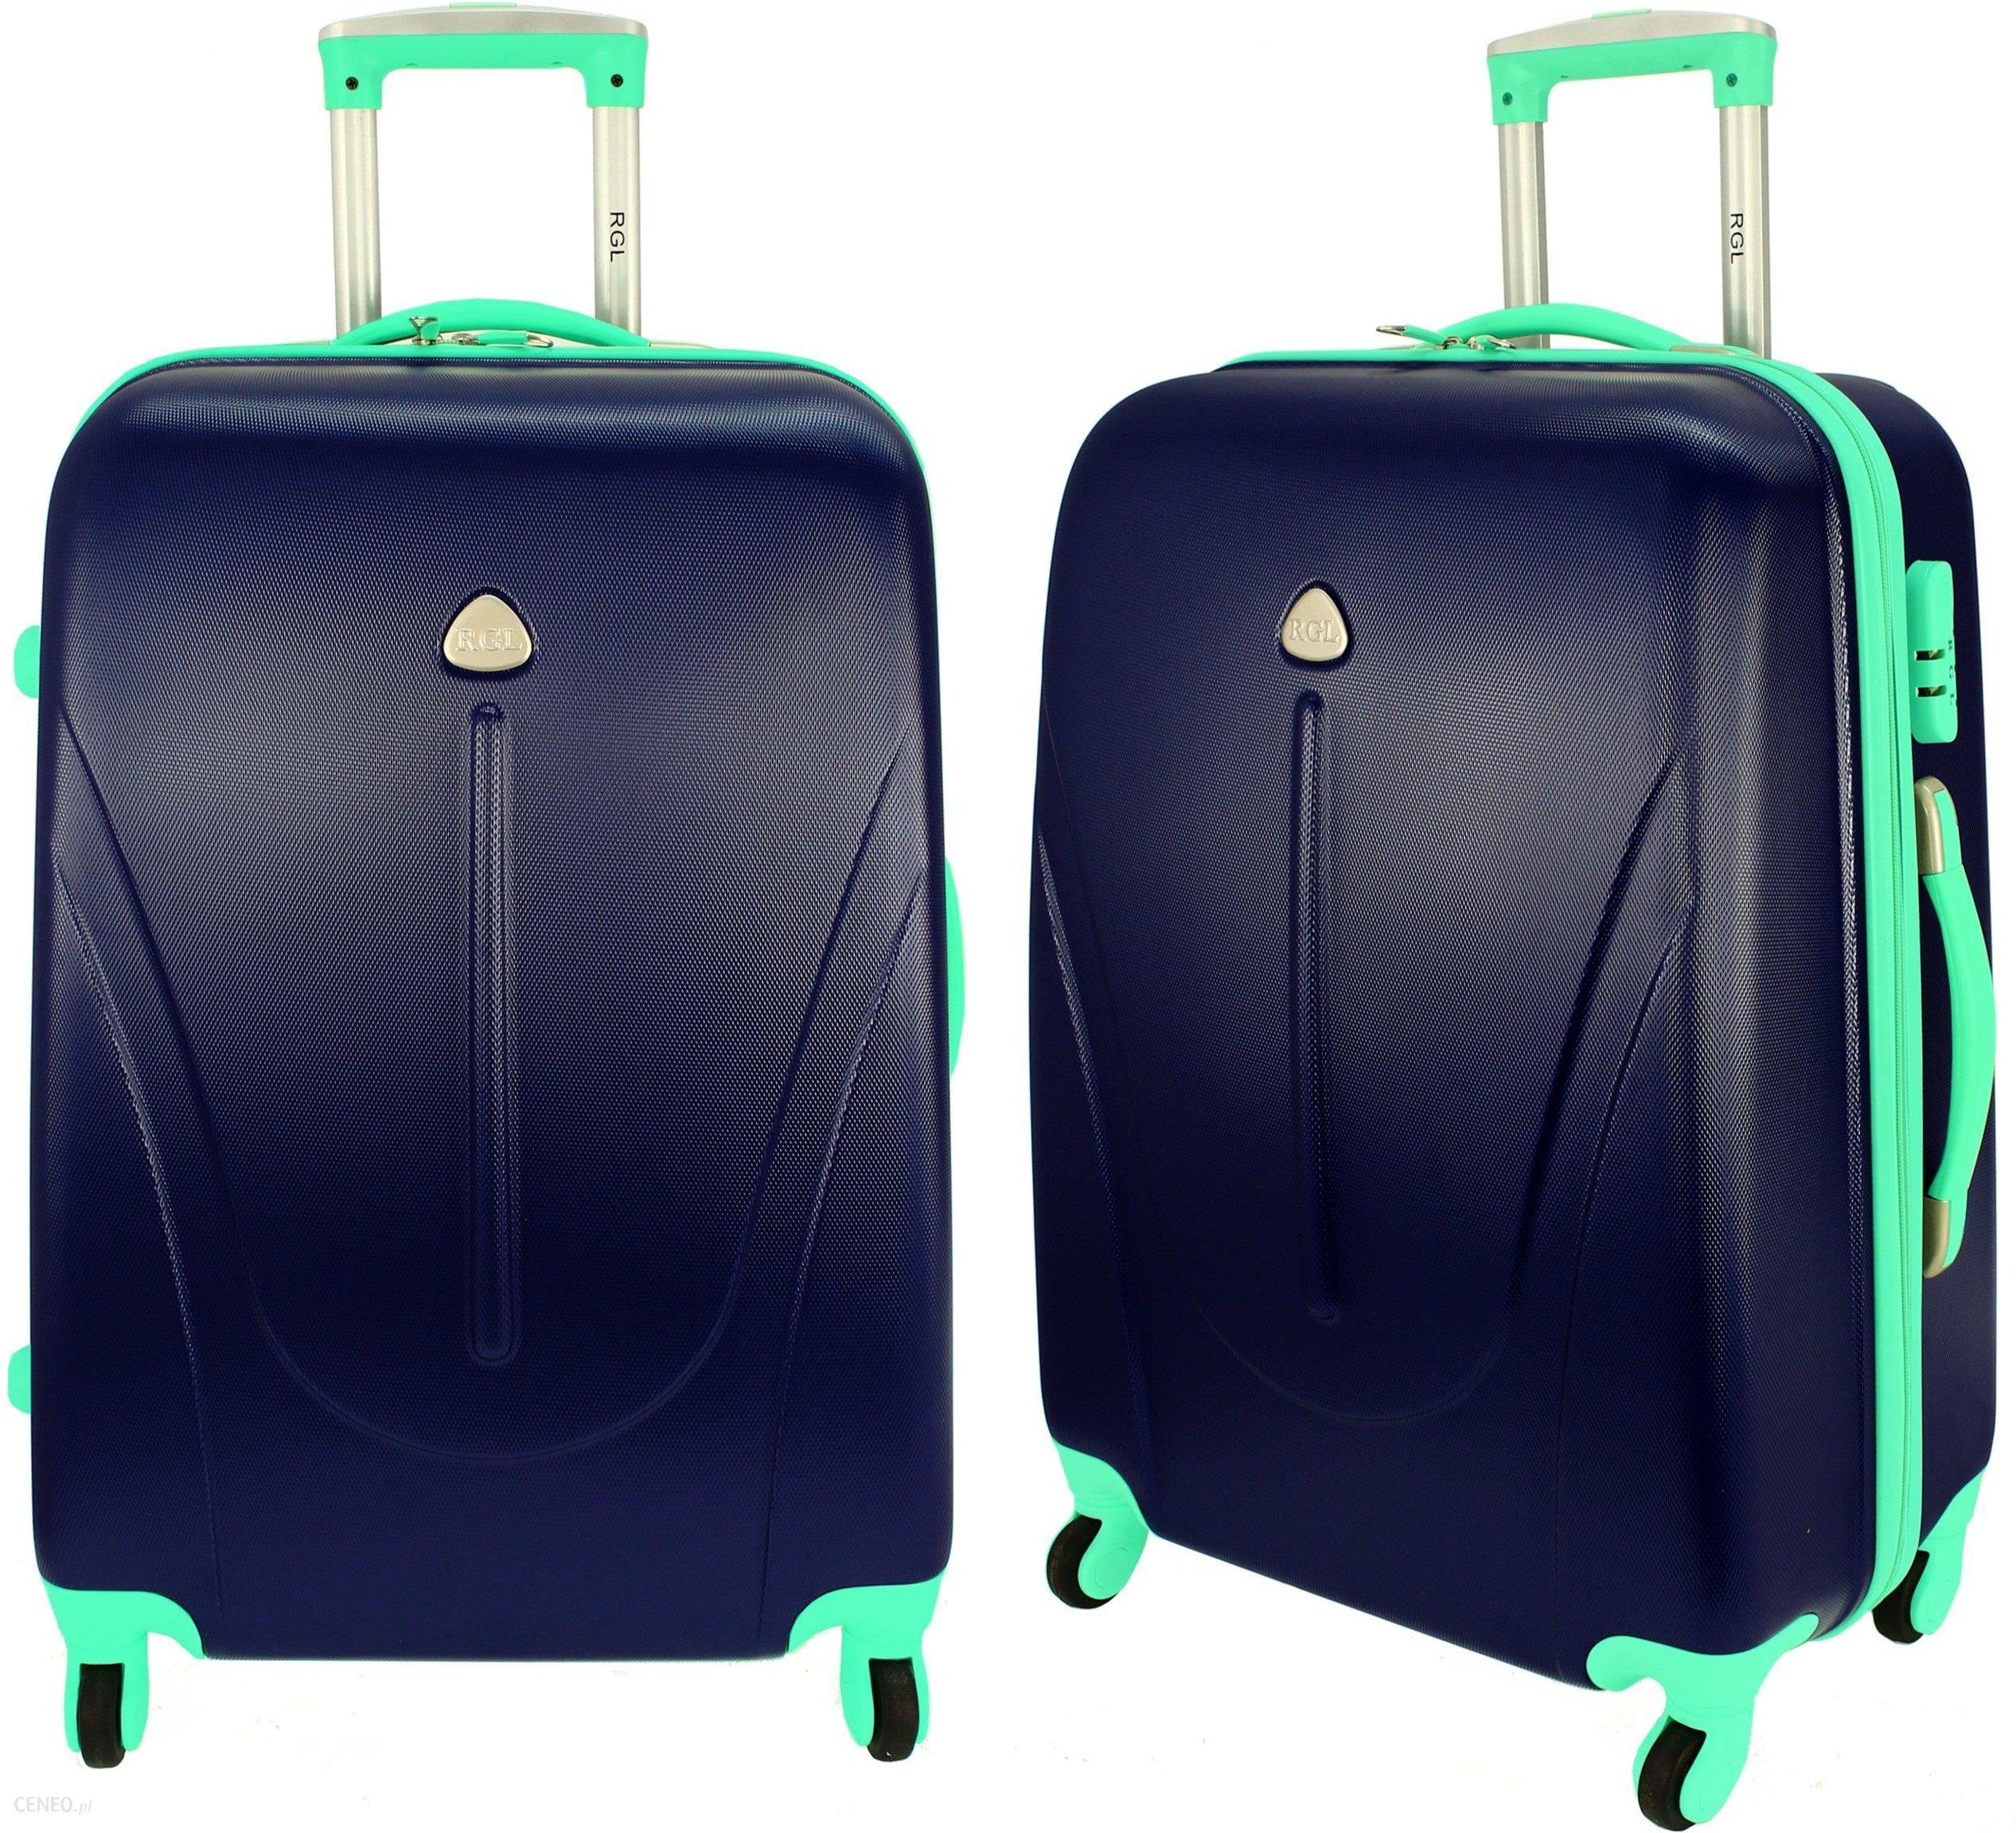 a8cf0d254e0af 883 Rgl Walizka podróżna na kółkach średnia bagaż - Ceny i opinie ...